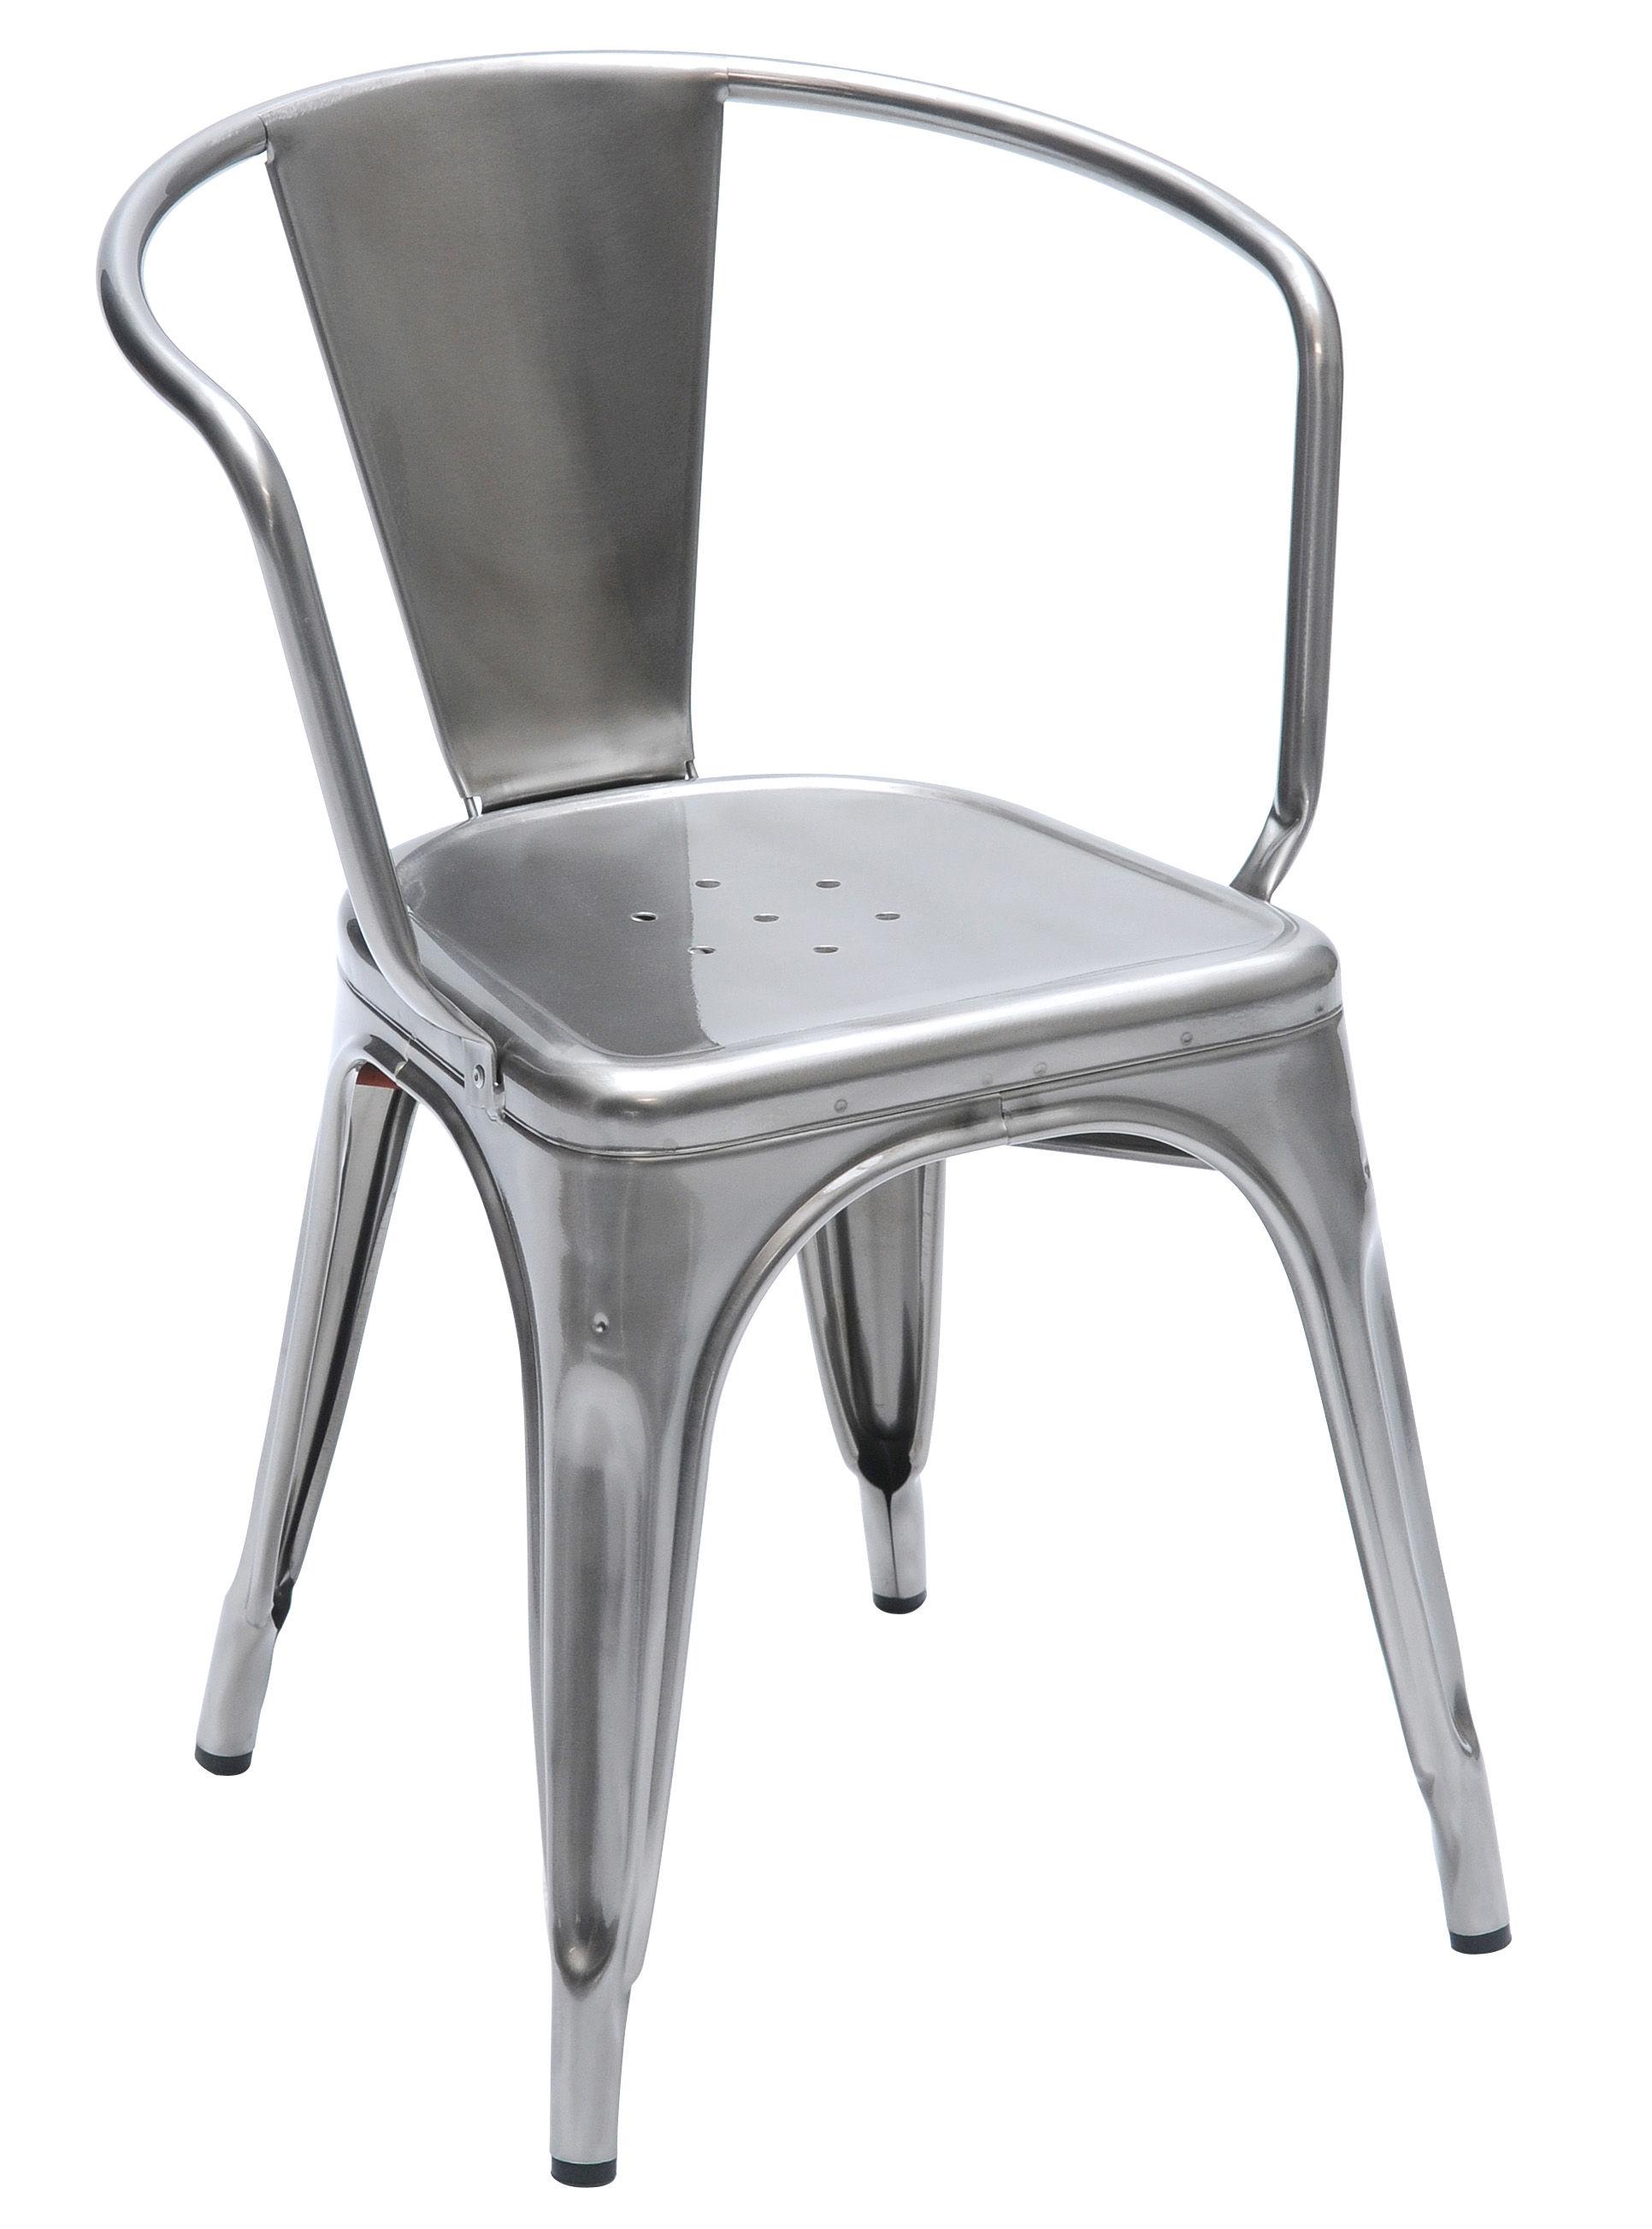 Möbel - Stühle  - A56 Stapelbarer Sessel lackierter Rohstahl - Tolix - Glänzend lackierter Rohstahl - Acier brut verni brillant